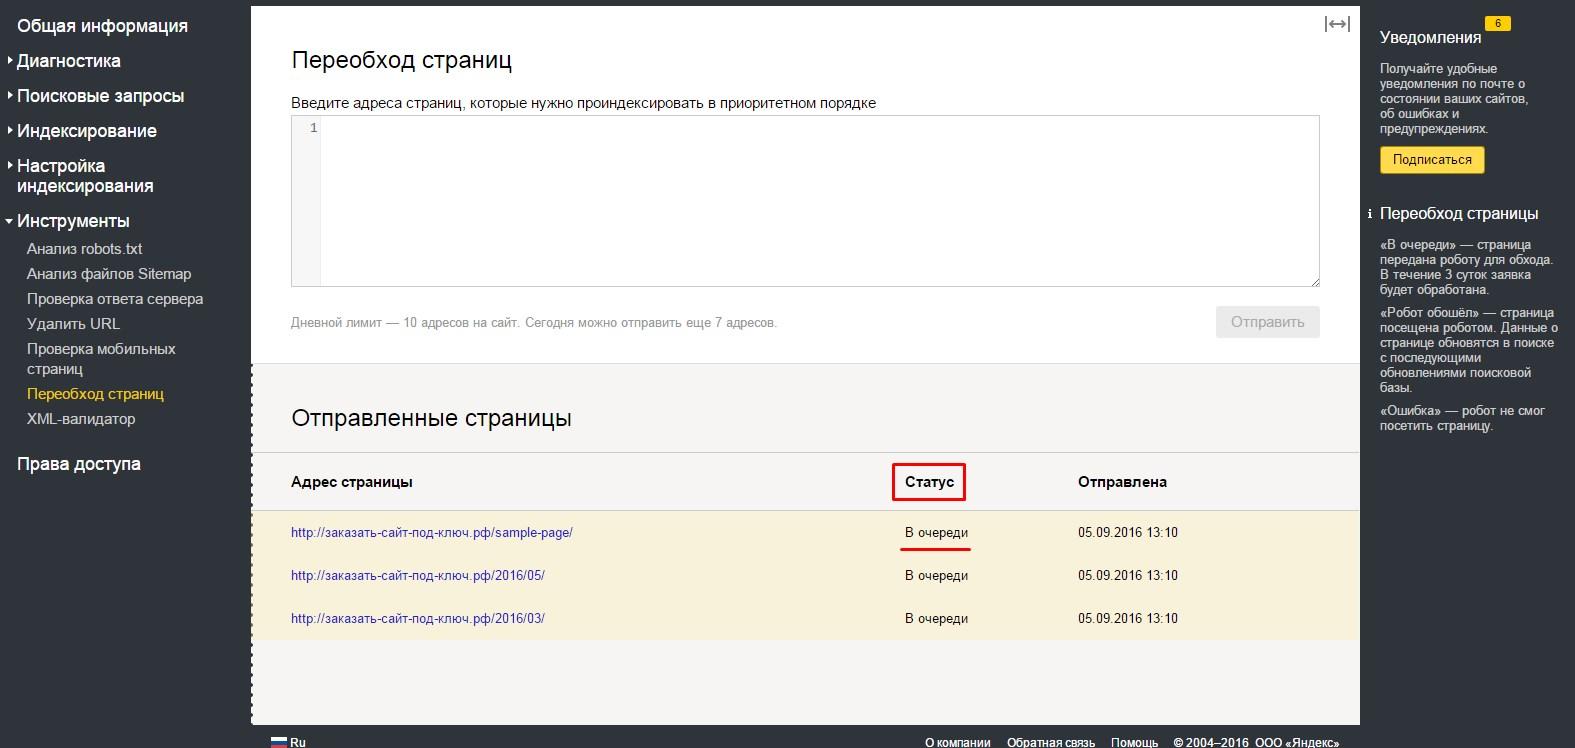 переобход страниц Яндекс